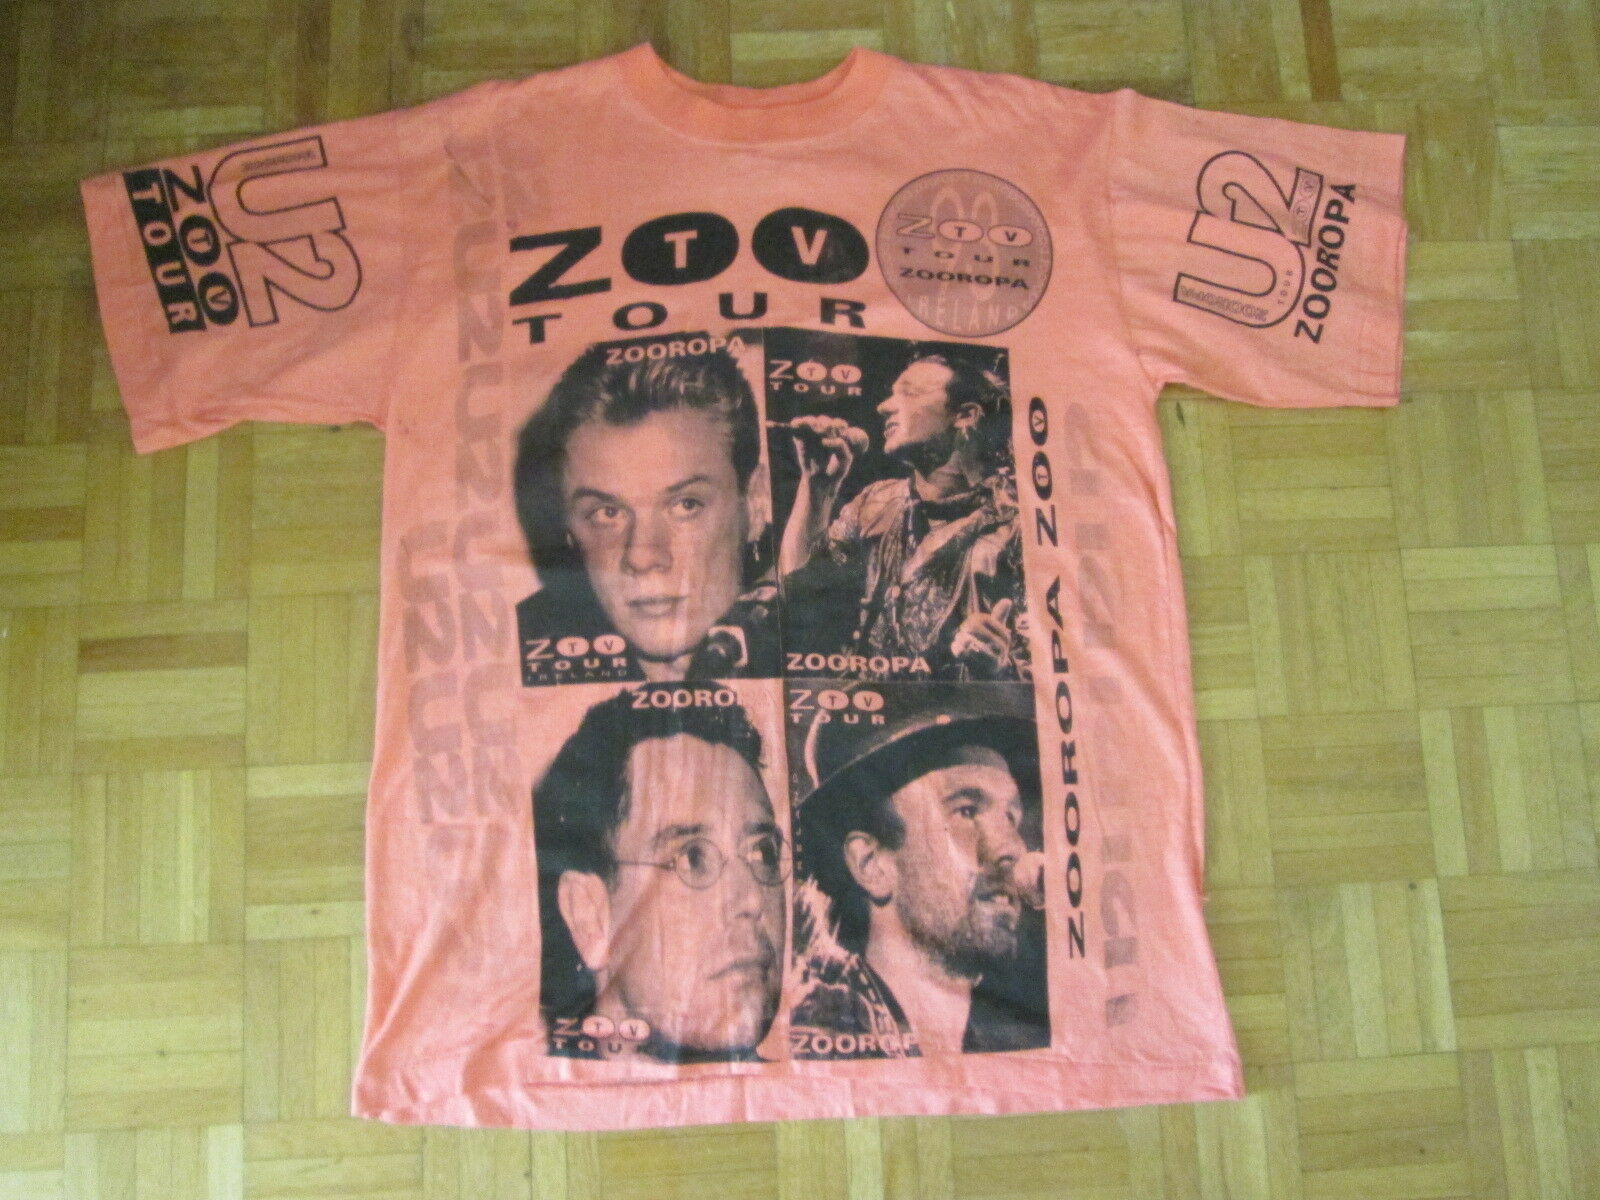 U2 Vintage Collectable Rare Zooropa Tv Tour Ireland 1993 TShirt